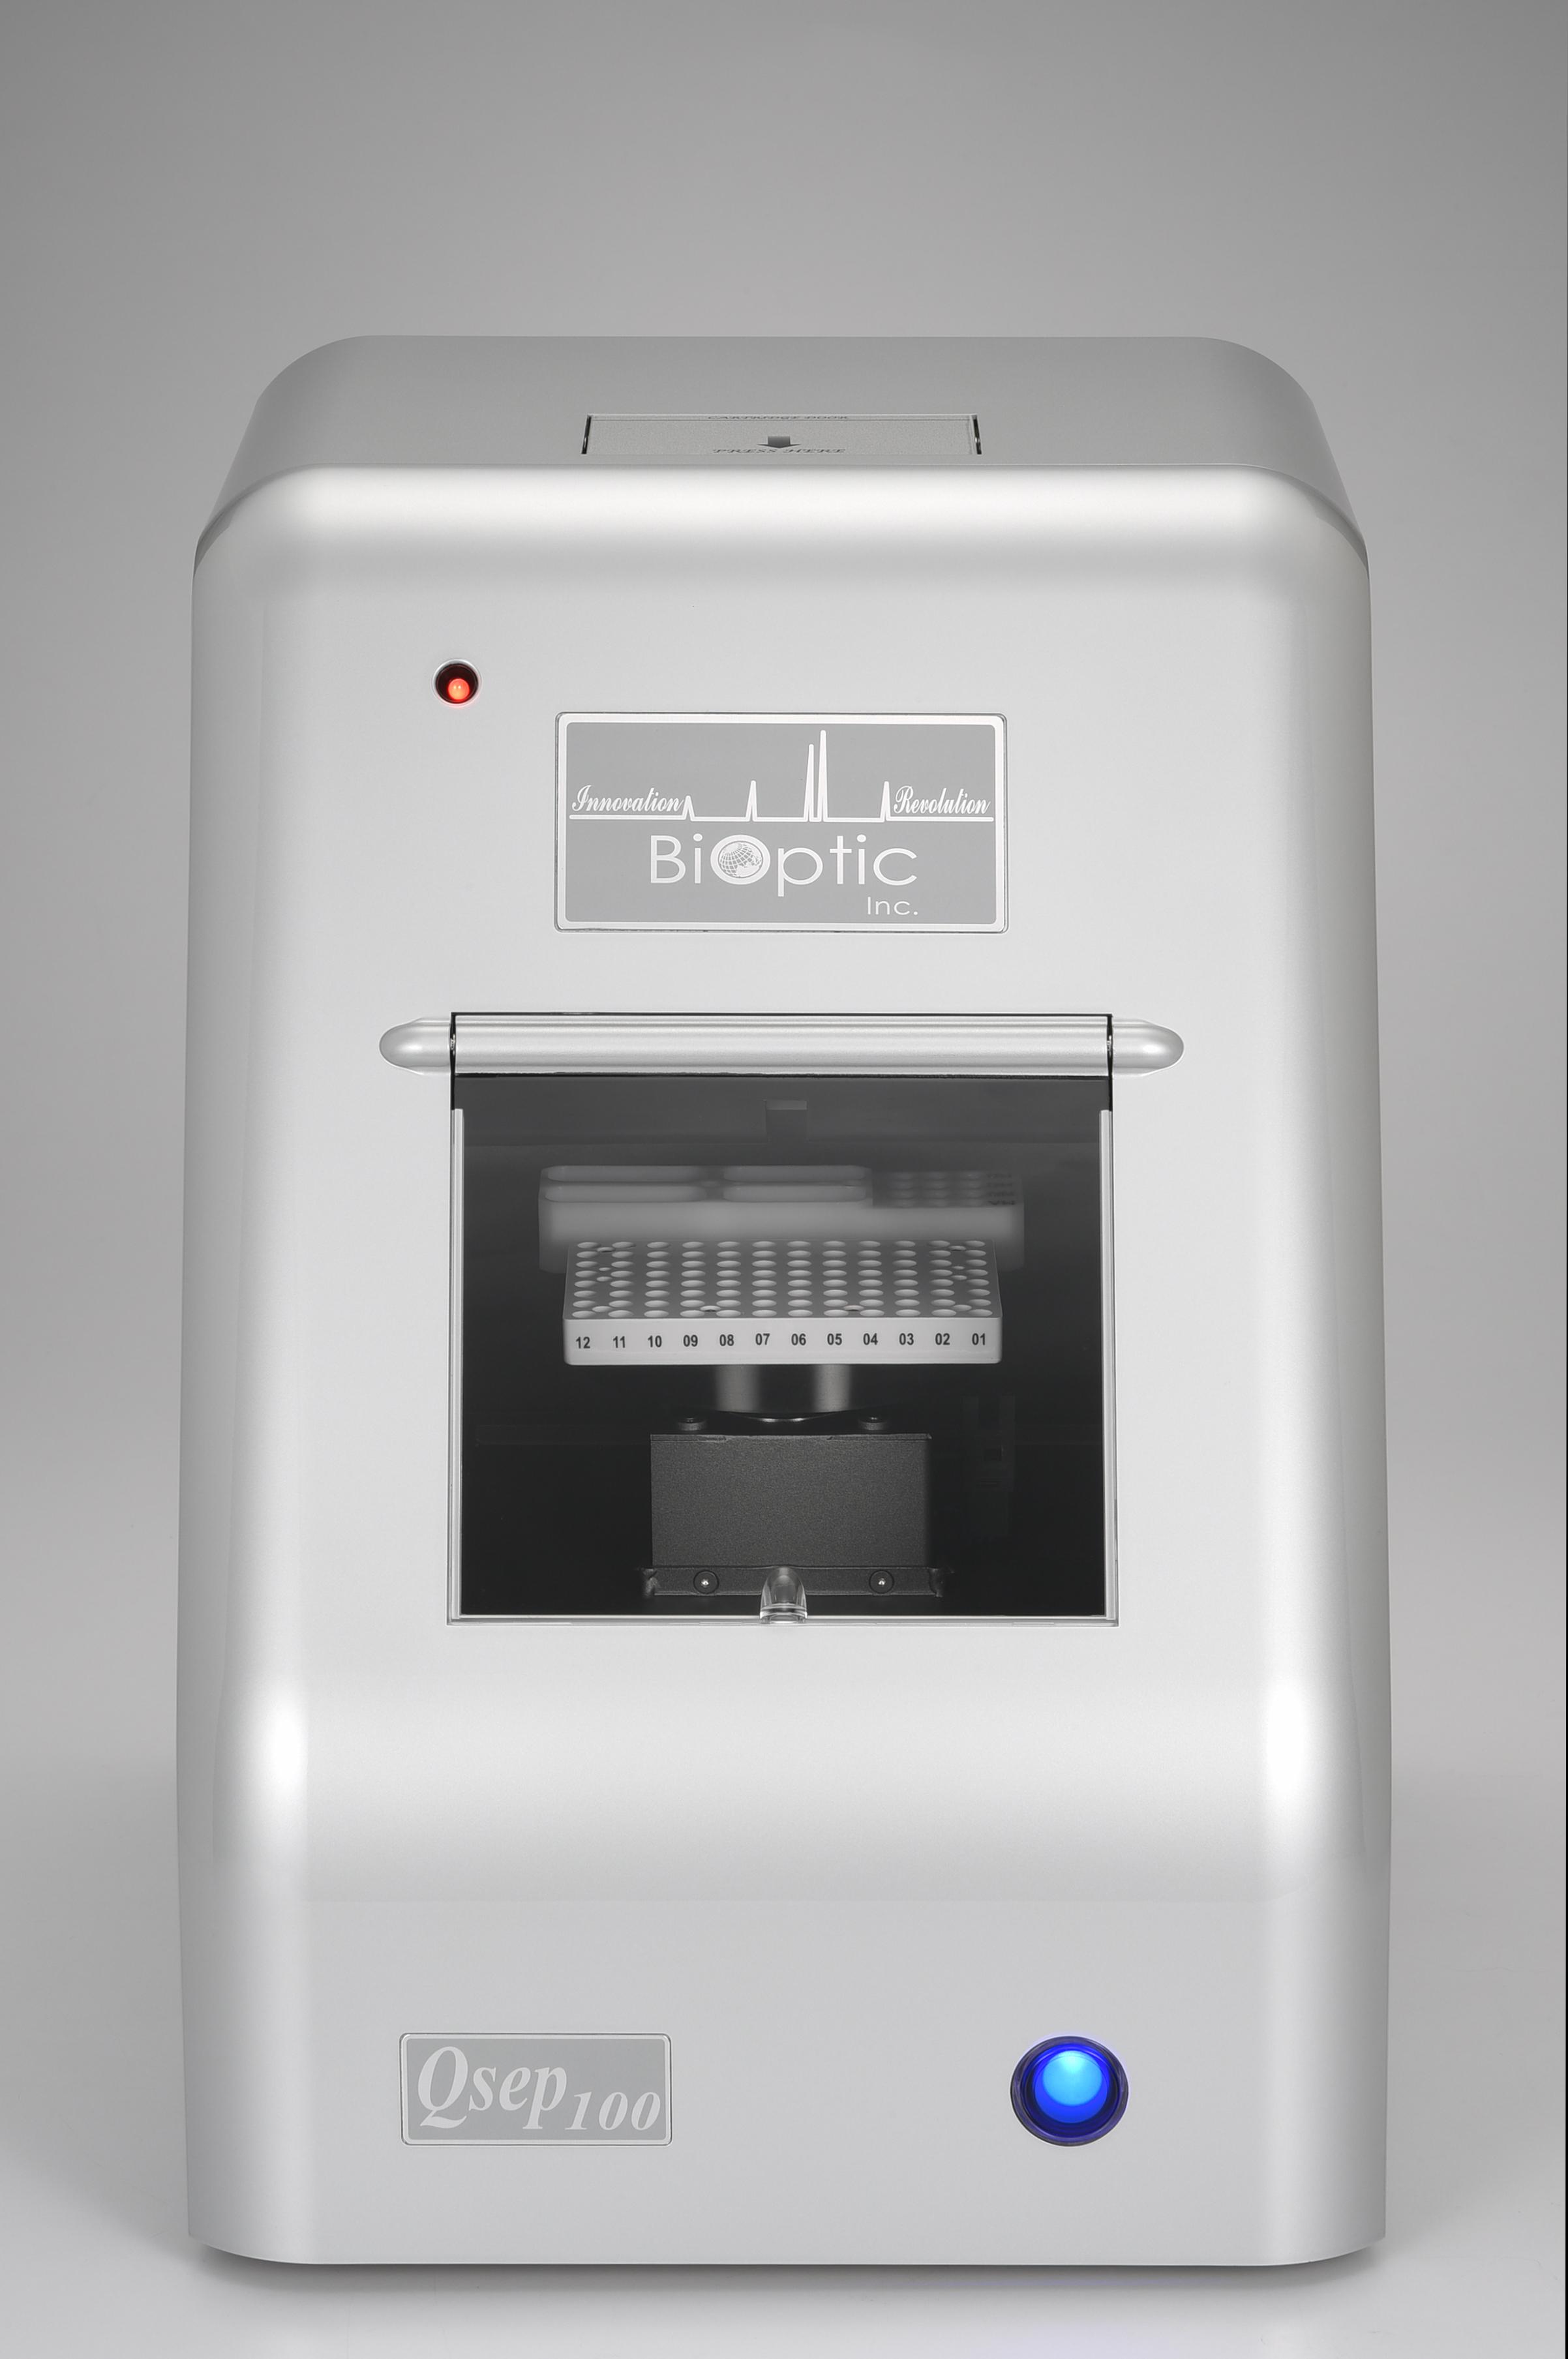 Qsep100全自动核酸蛋白分析系统